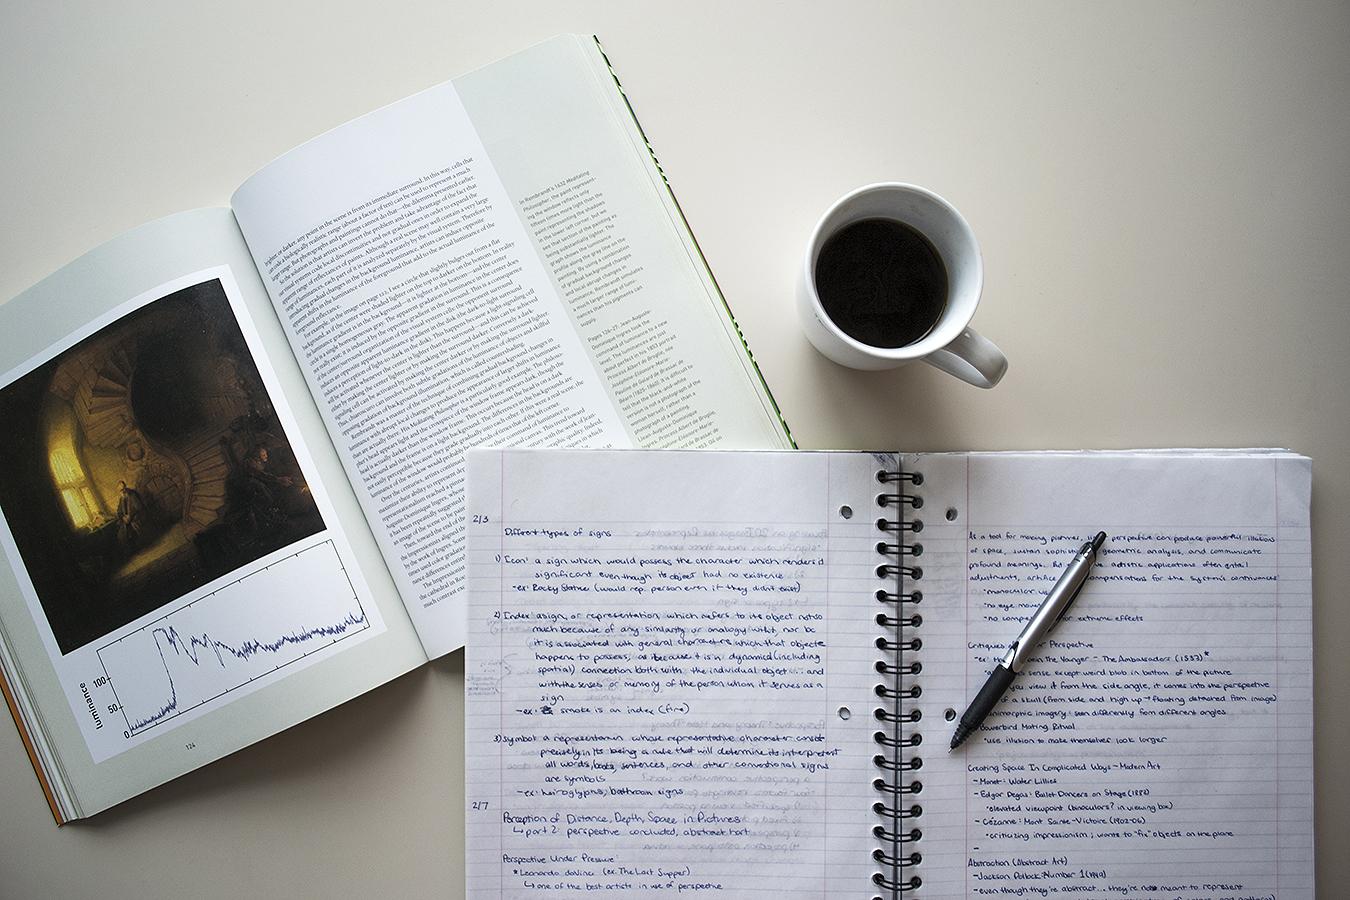 Alexis_Masino_photography_drugs_coffee_habits_addiction_UPenn_student_addictions